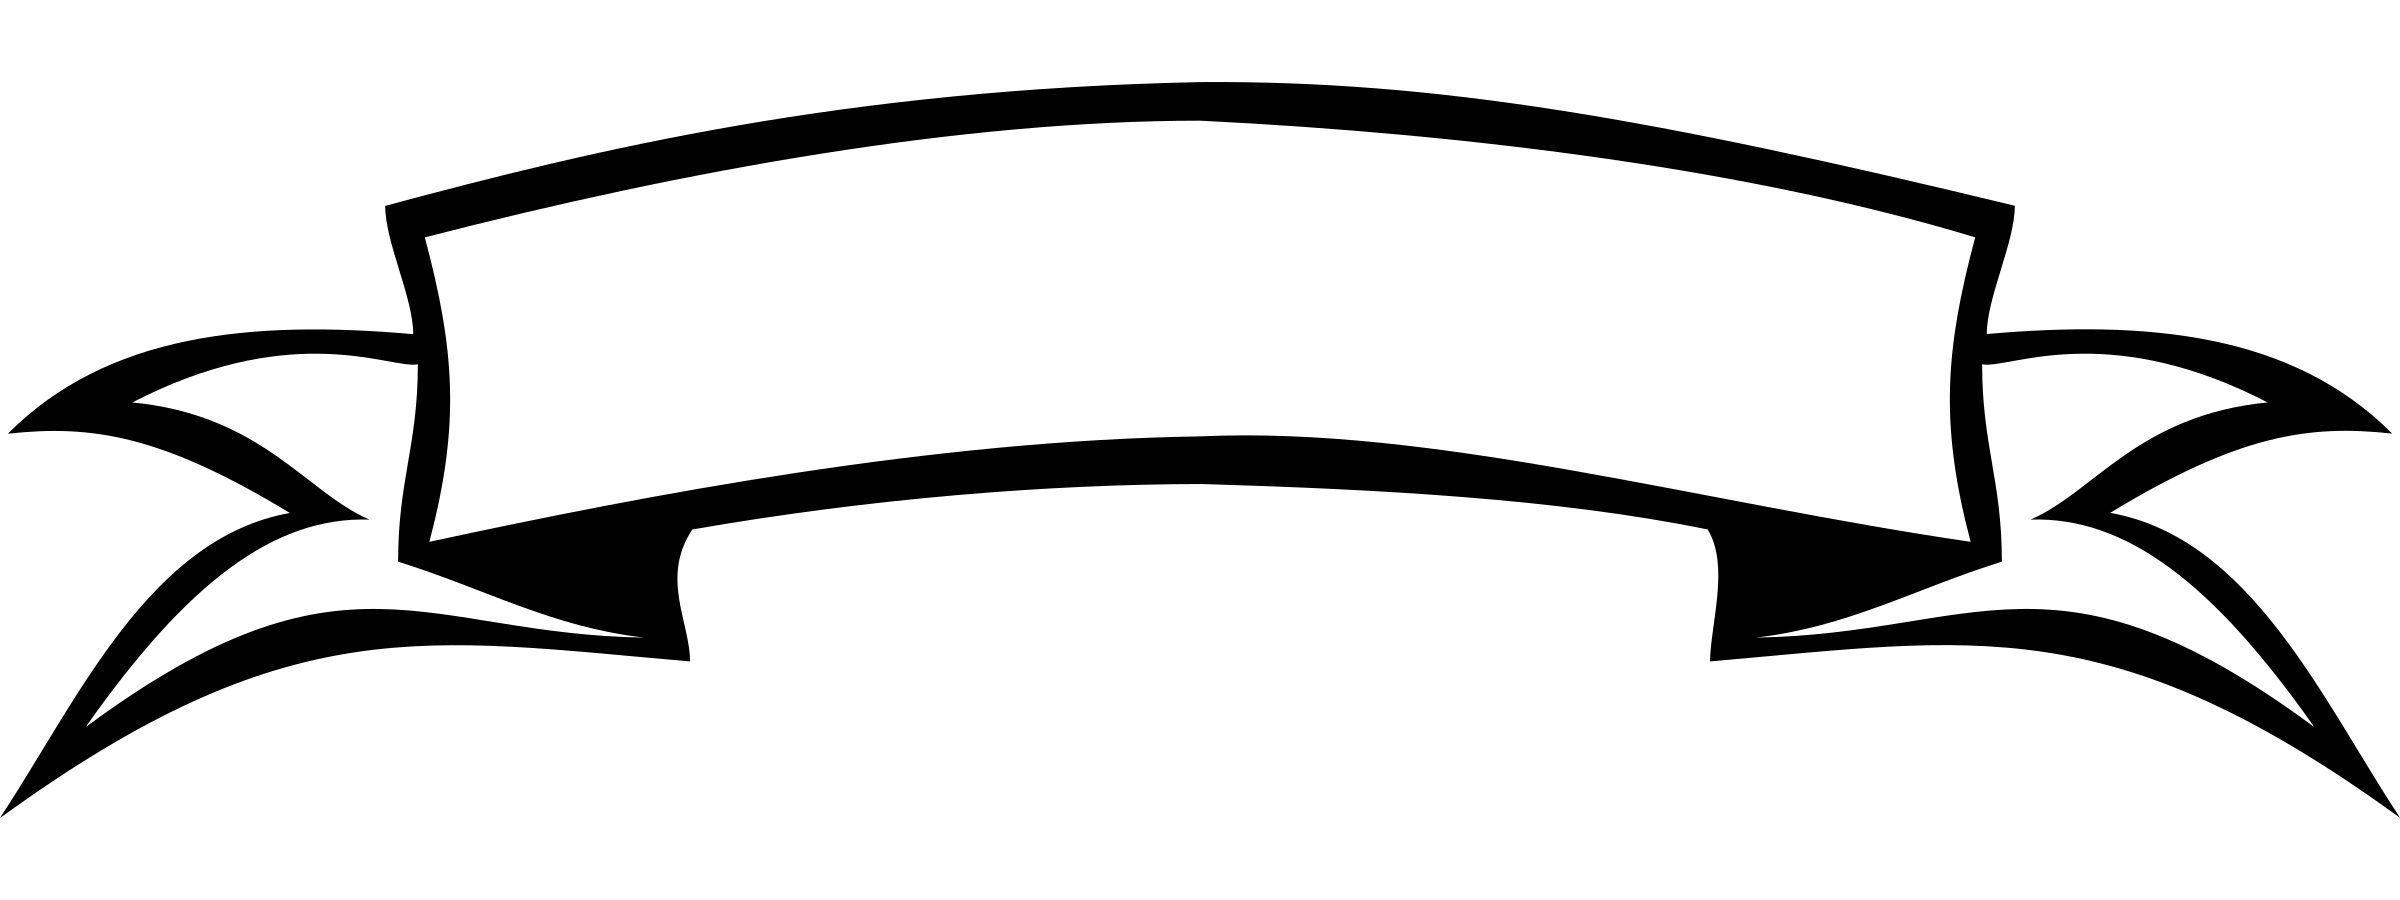 Black And White Banner Png Theveliger With White Banner Png 10161 Hitam Dan Putih Clip Art Gambar Garis